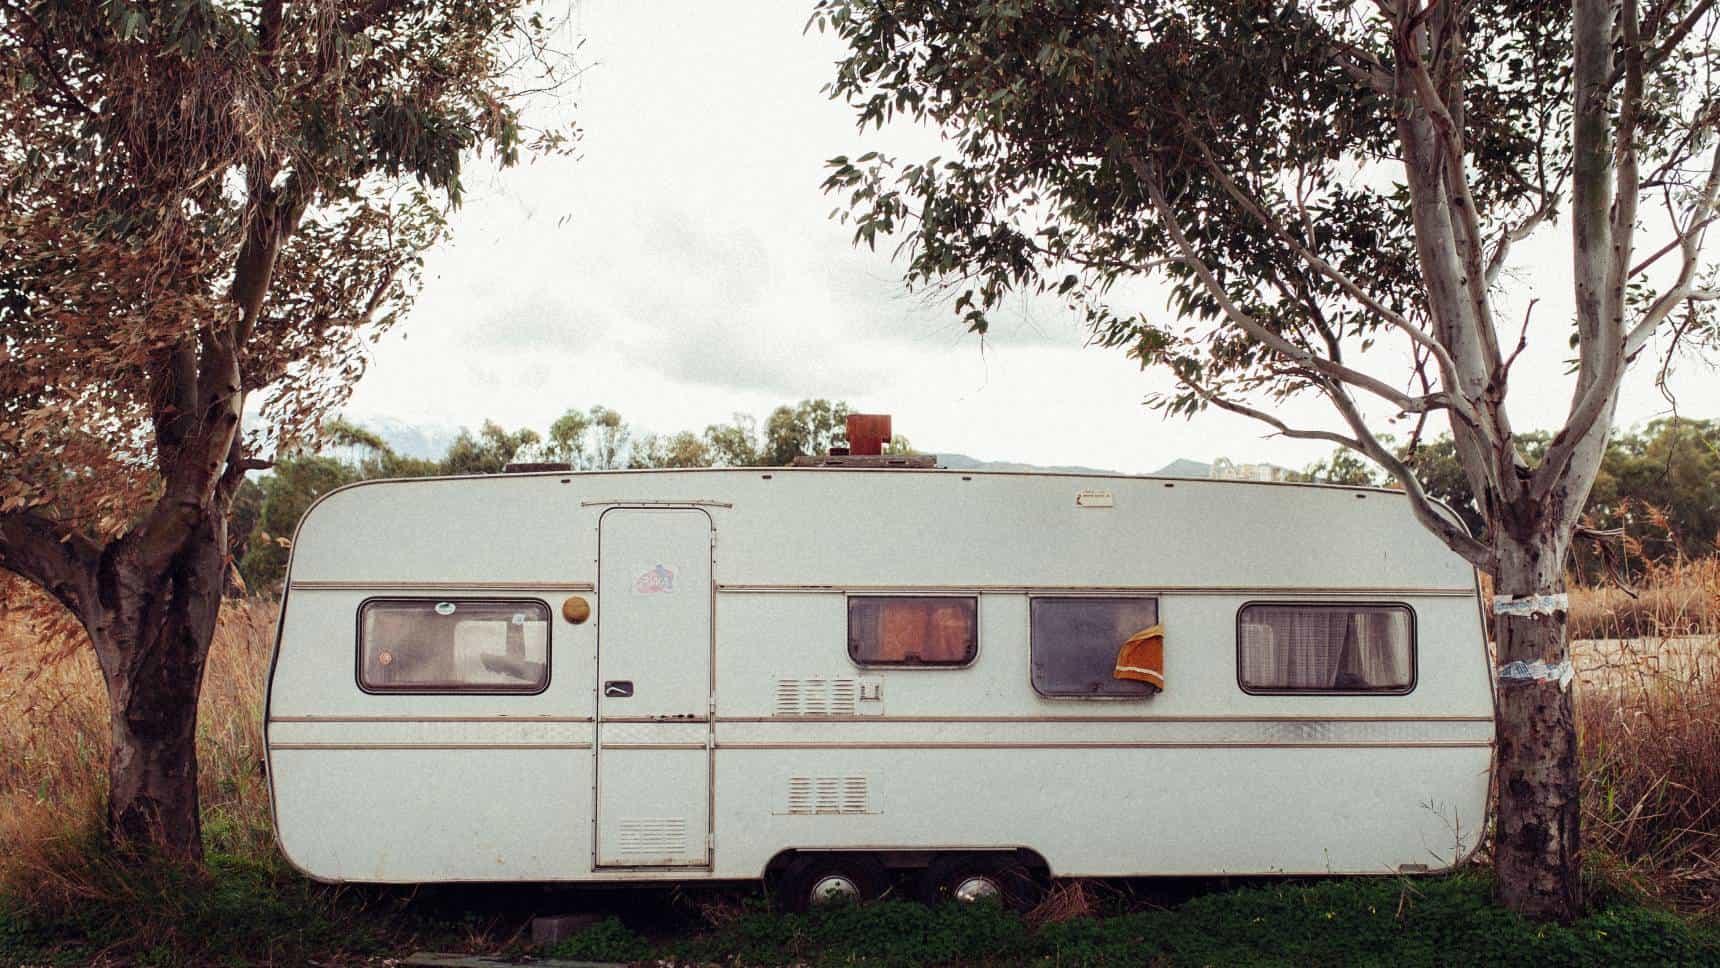 Private caravans for hire